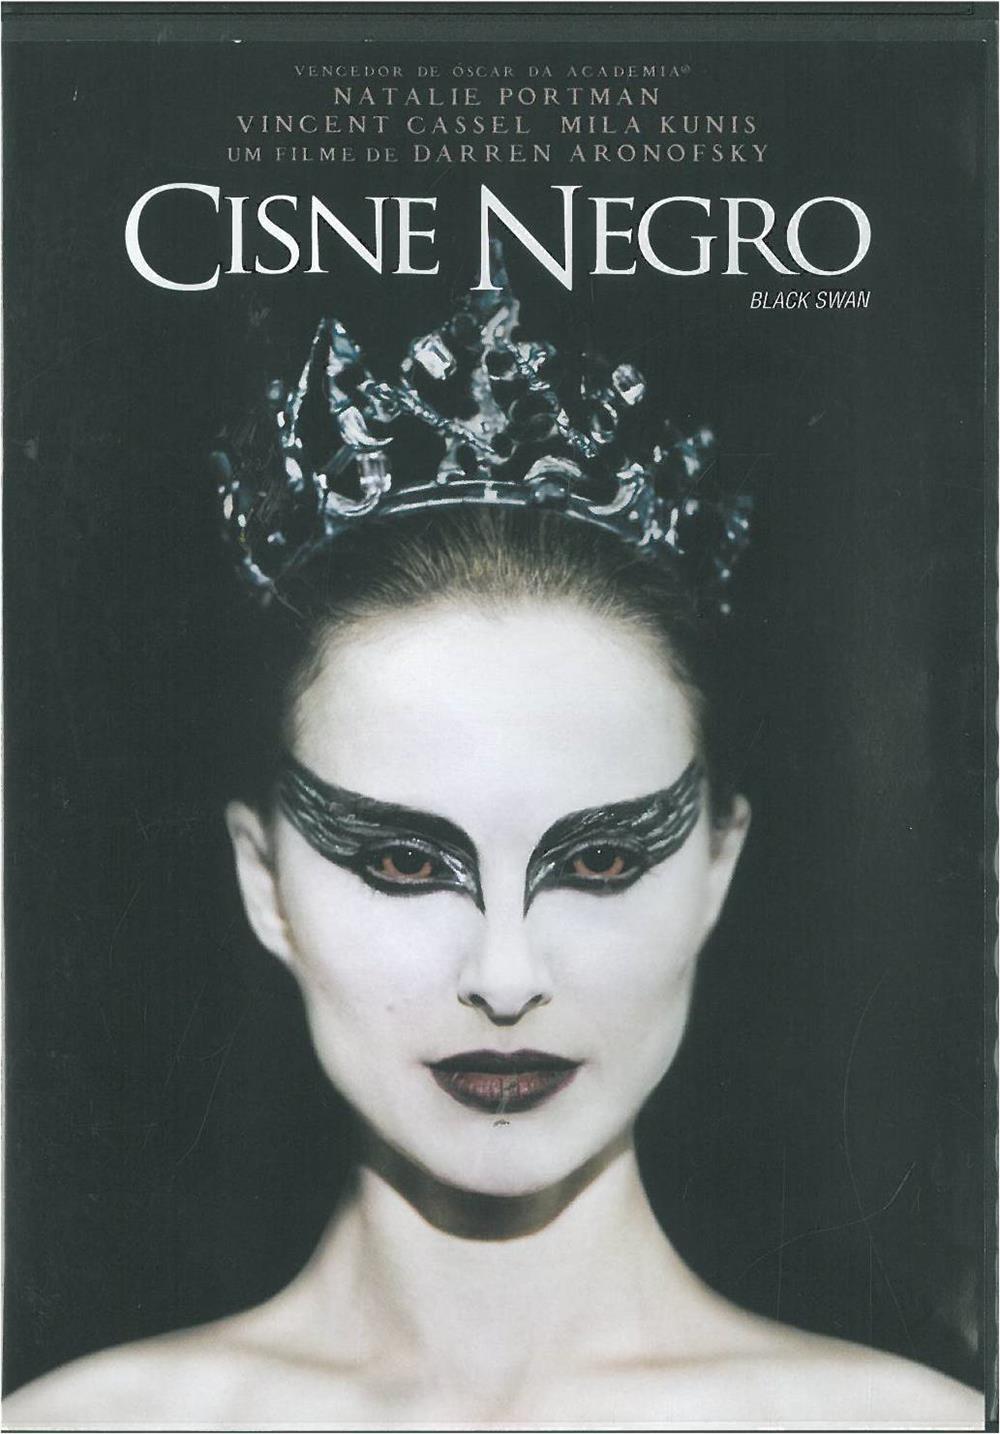 Cisne negro_DVD.jpg